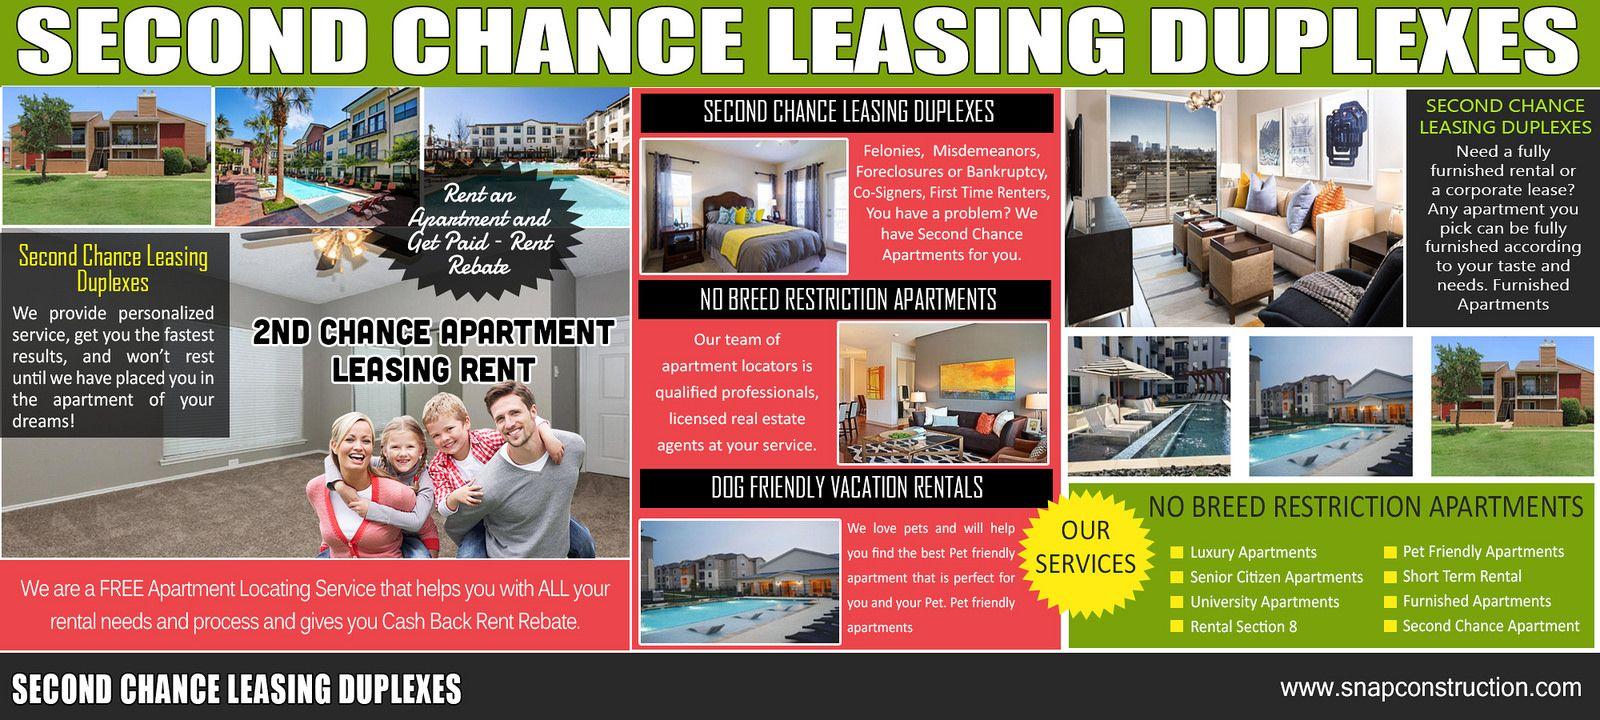 https//flic.kr/p/S4iShL Second Chance Leasing Duplexes